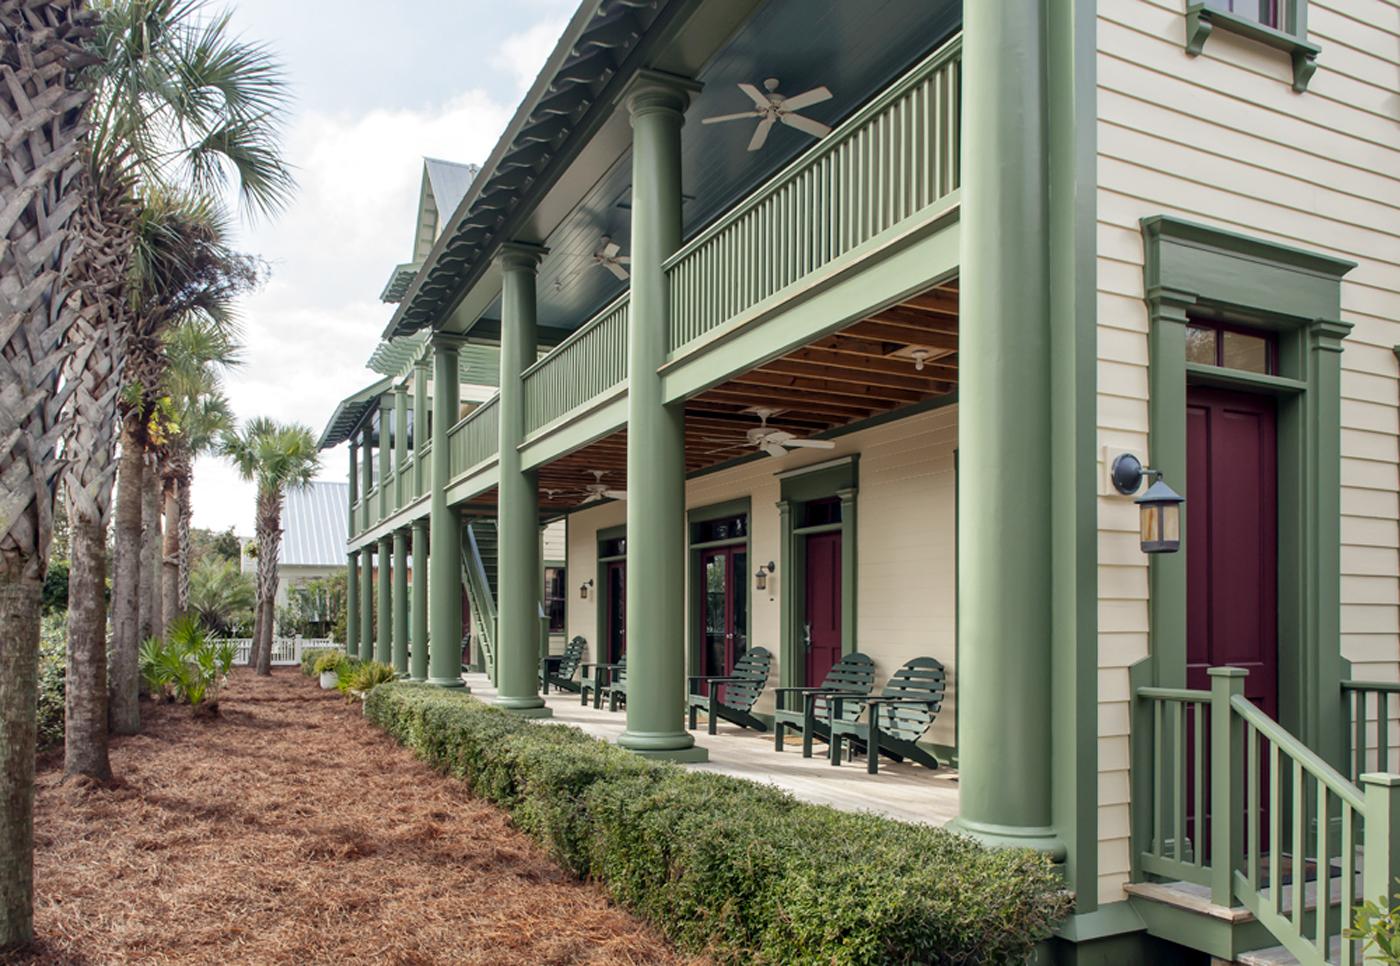 Seaside_Florida.Beach.Natchez_House.New_Urbanism.CNU.Courtyard.Walkable.Robert_Orr_&_Associates.Architecture.Landscape_Architecture.Urbanism.Side_Porch.jpeg